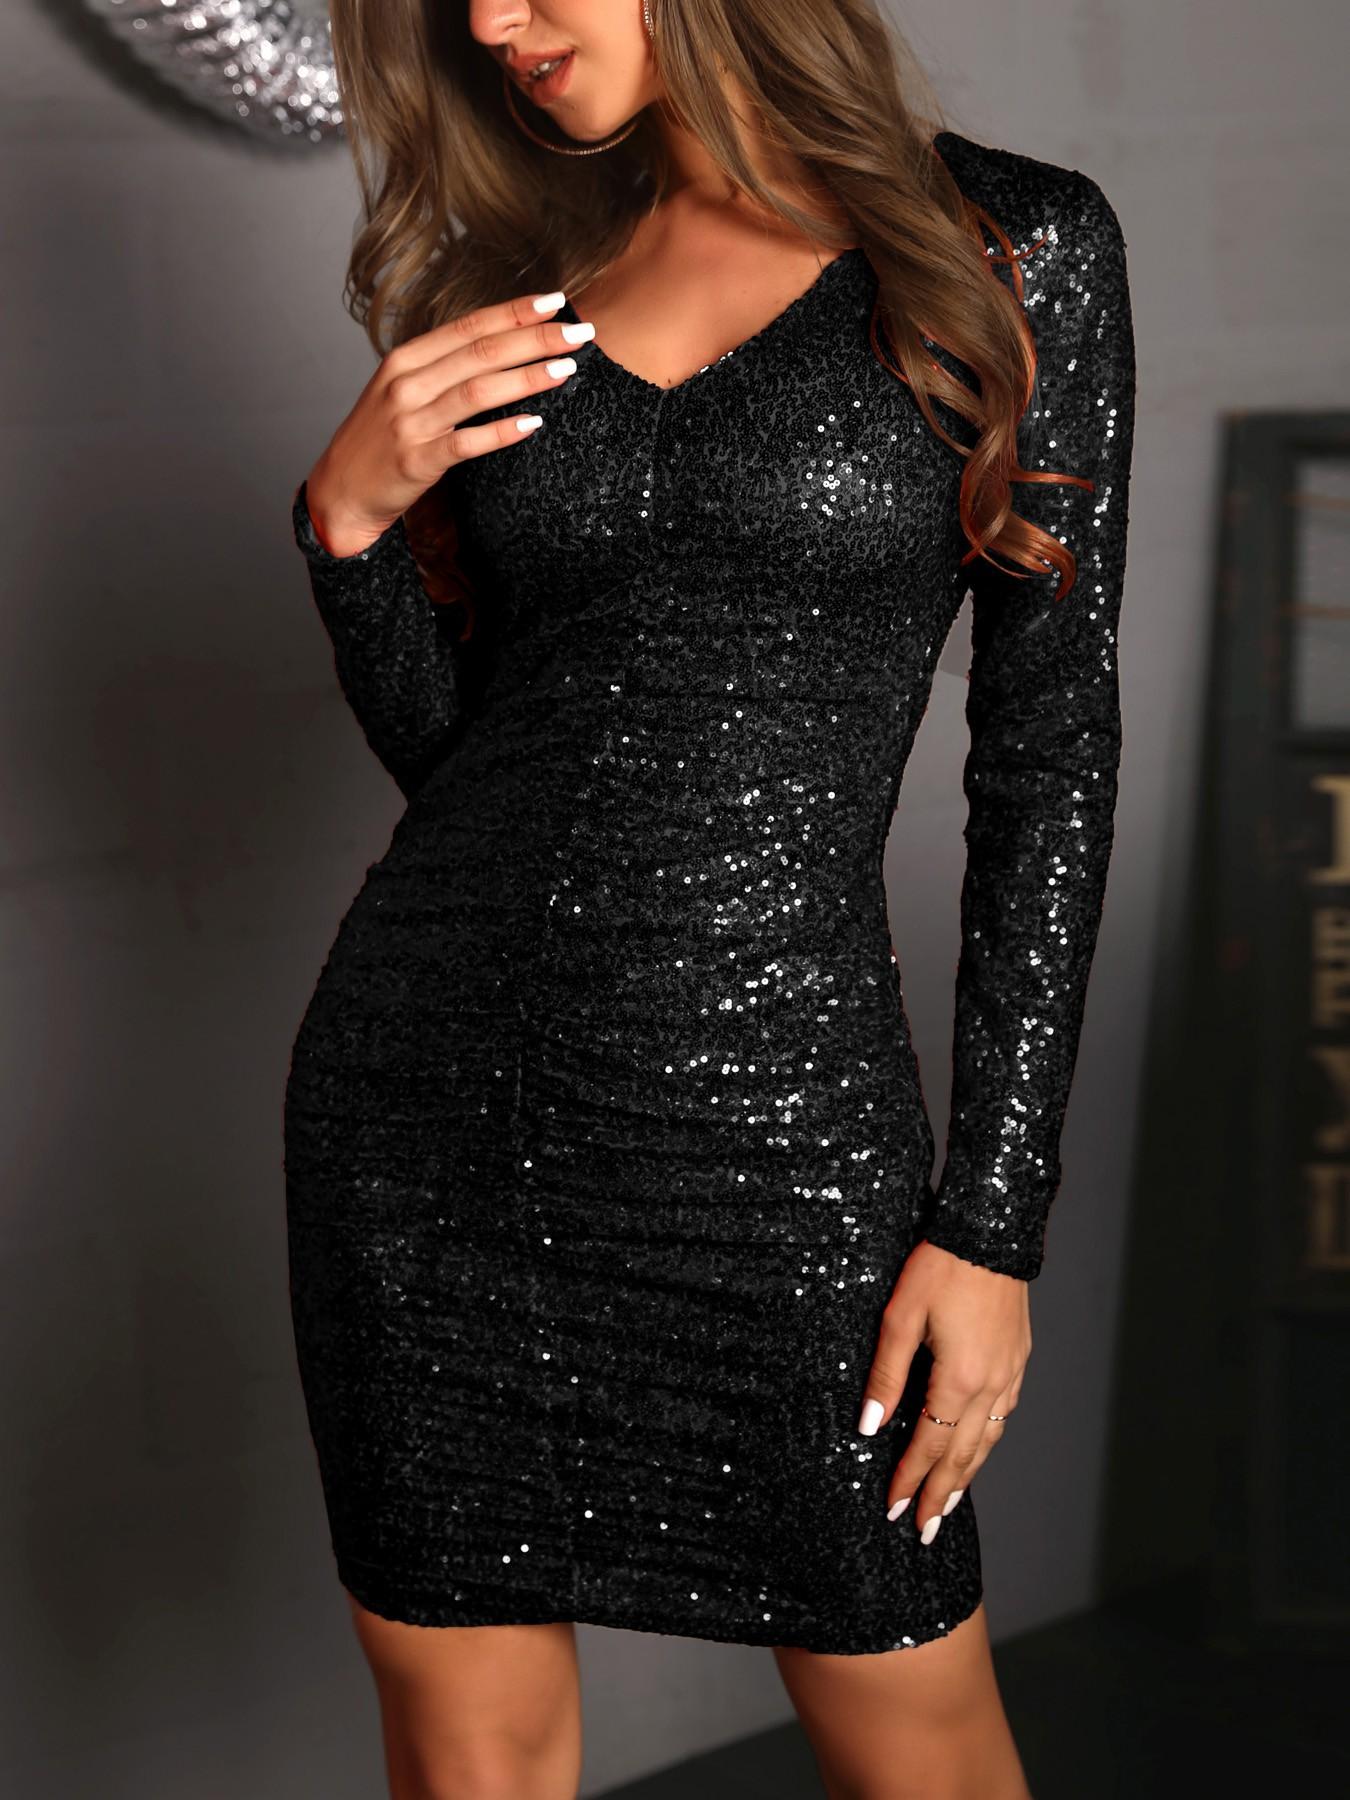 Ruched Design Sequin Dress